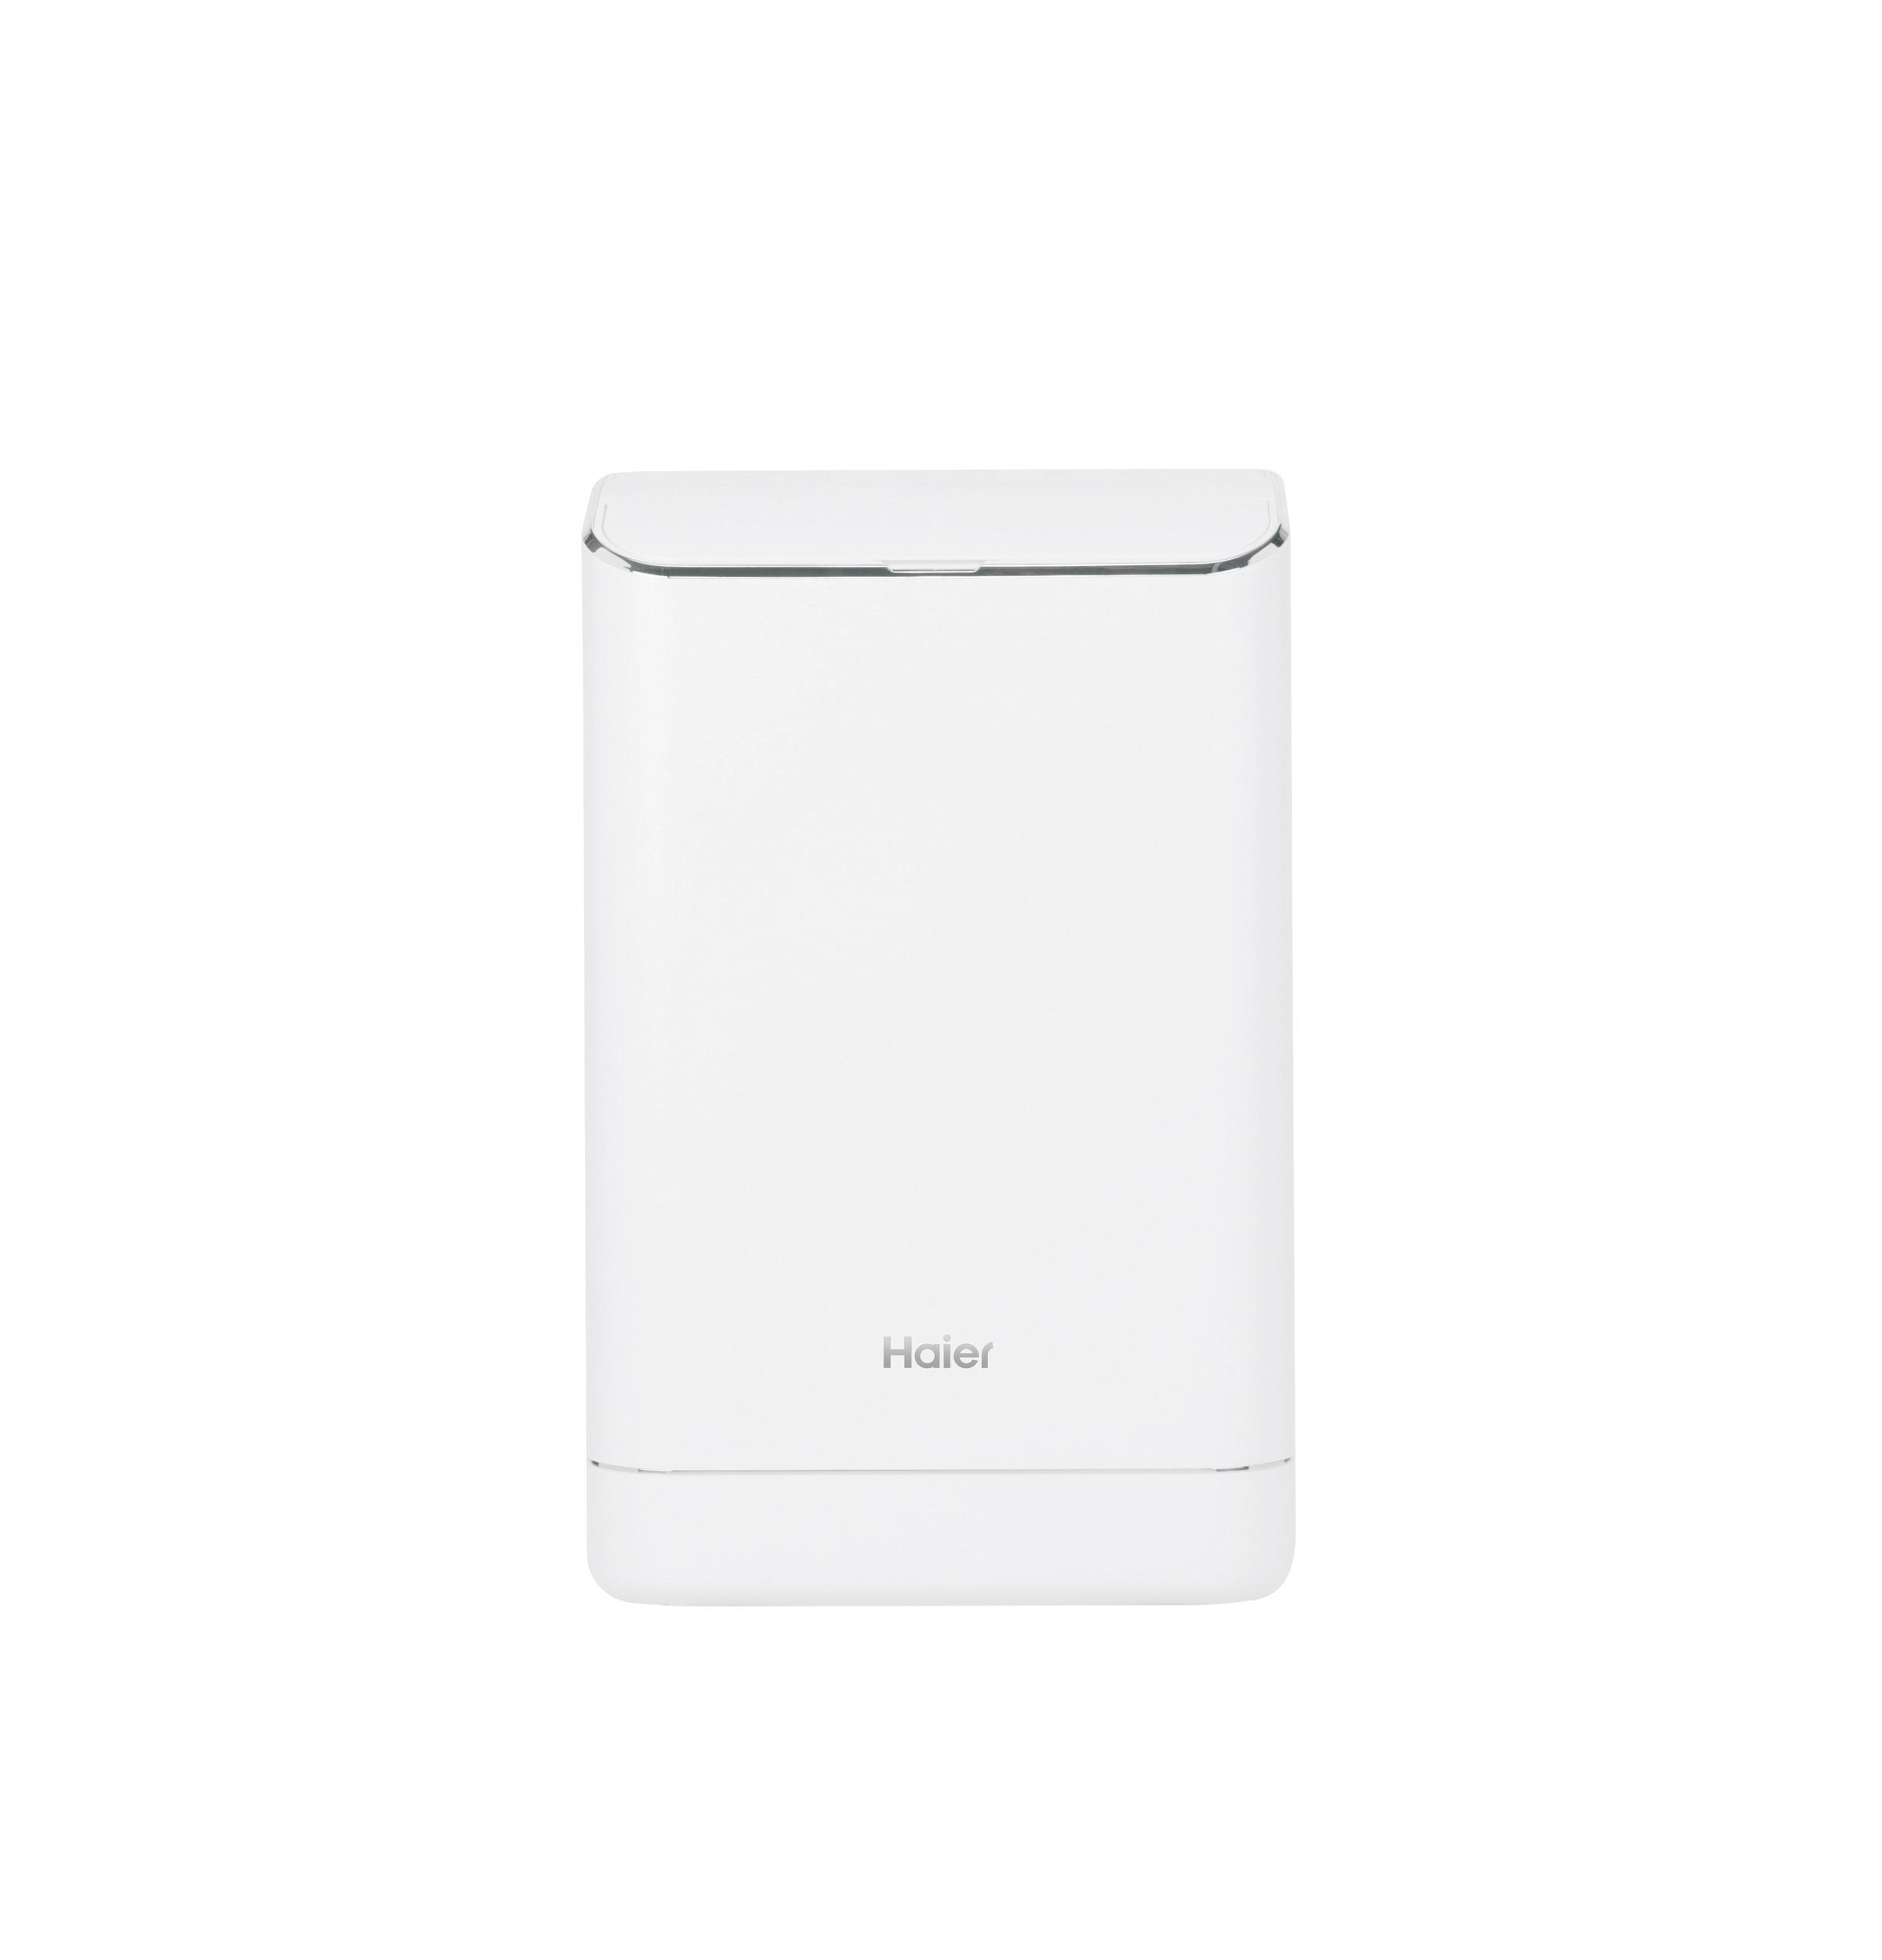 Haier Haier® Portable Air Conditioner with Dehumidifier for Medium Rooms up to 450 sq. ft., 12,000 BTU (8,200 BTU SACC)